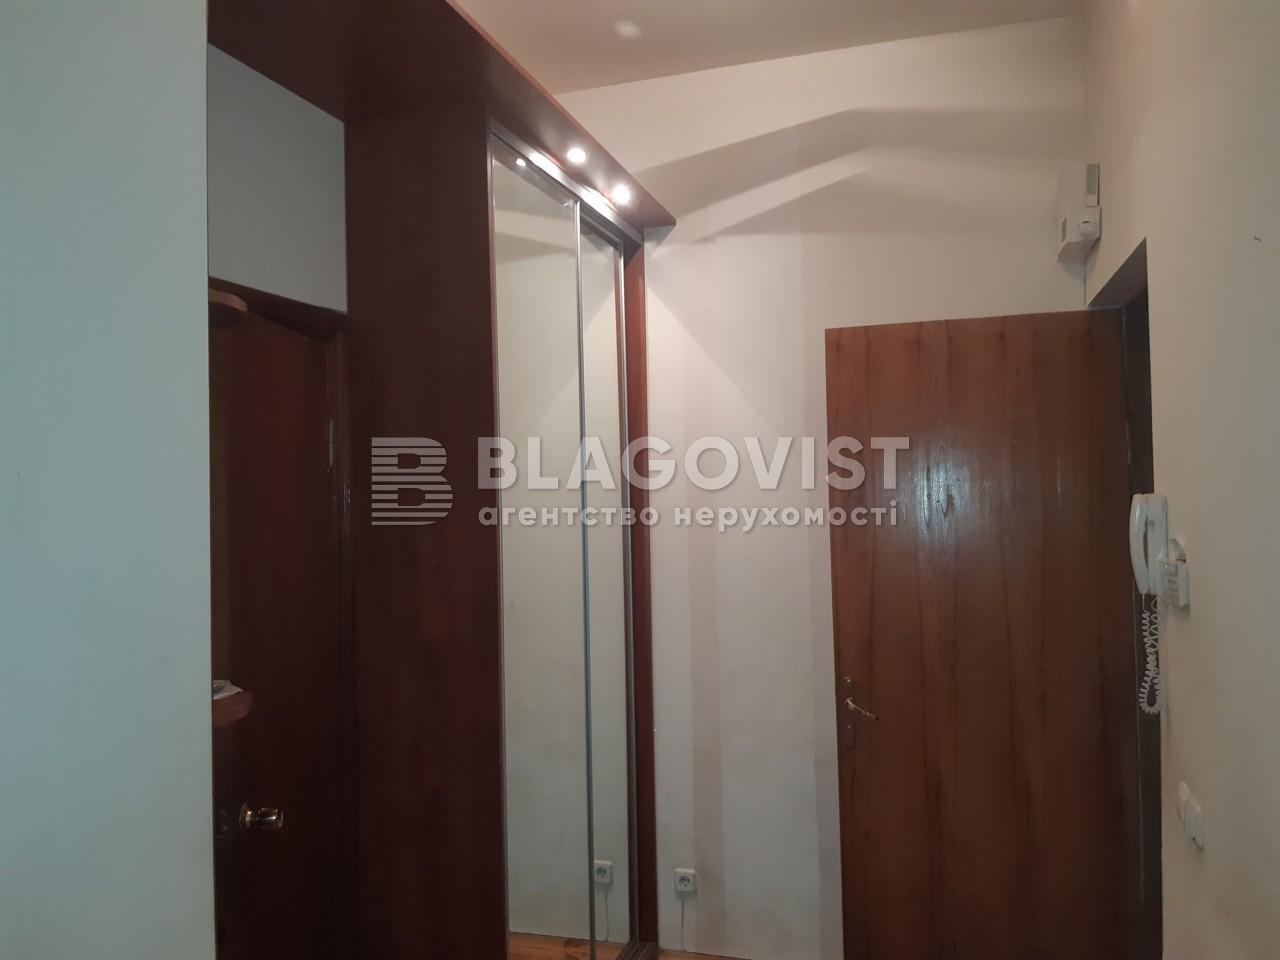 Квартира R-40017, Саксаганского, 36, Киев - Фото 14